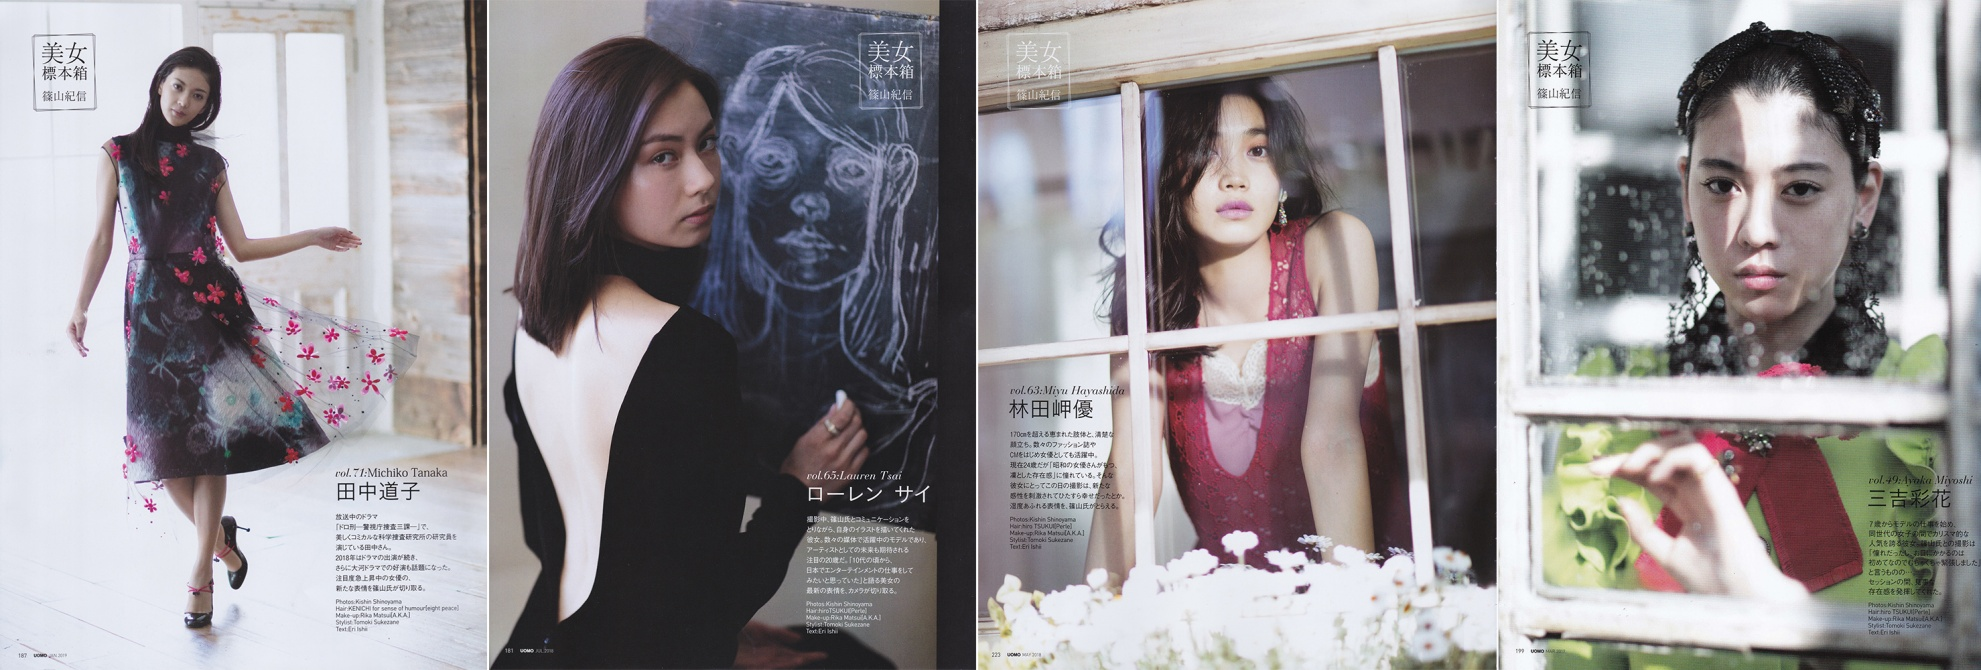 UOMO / 篠山紀信